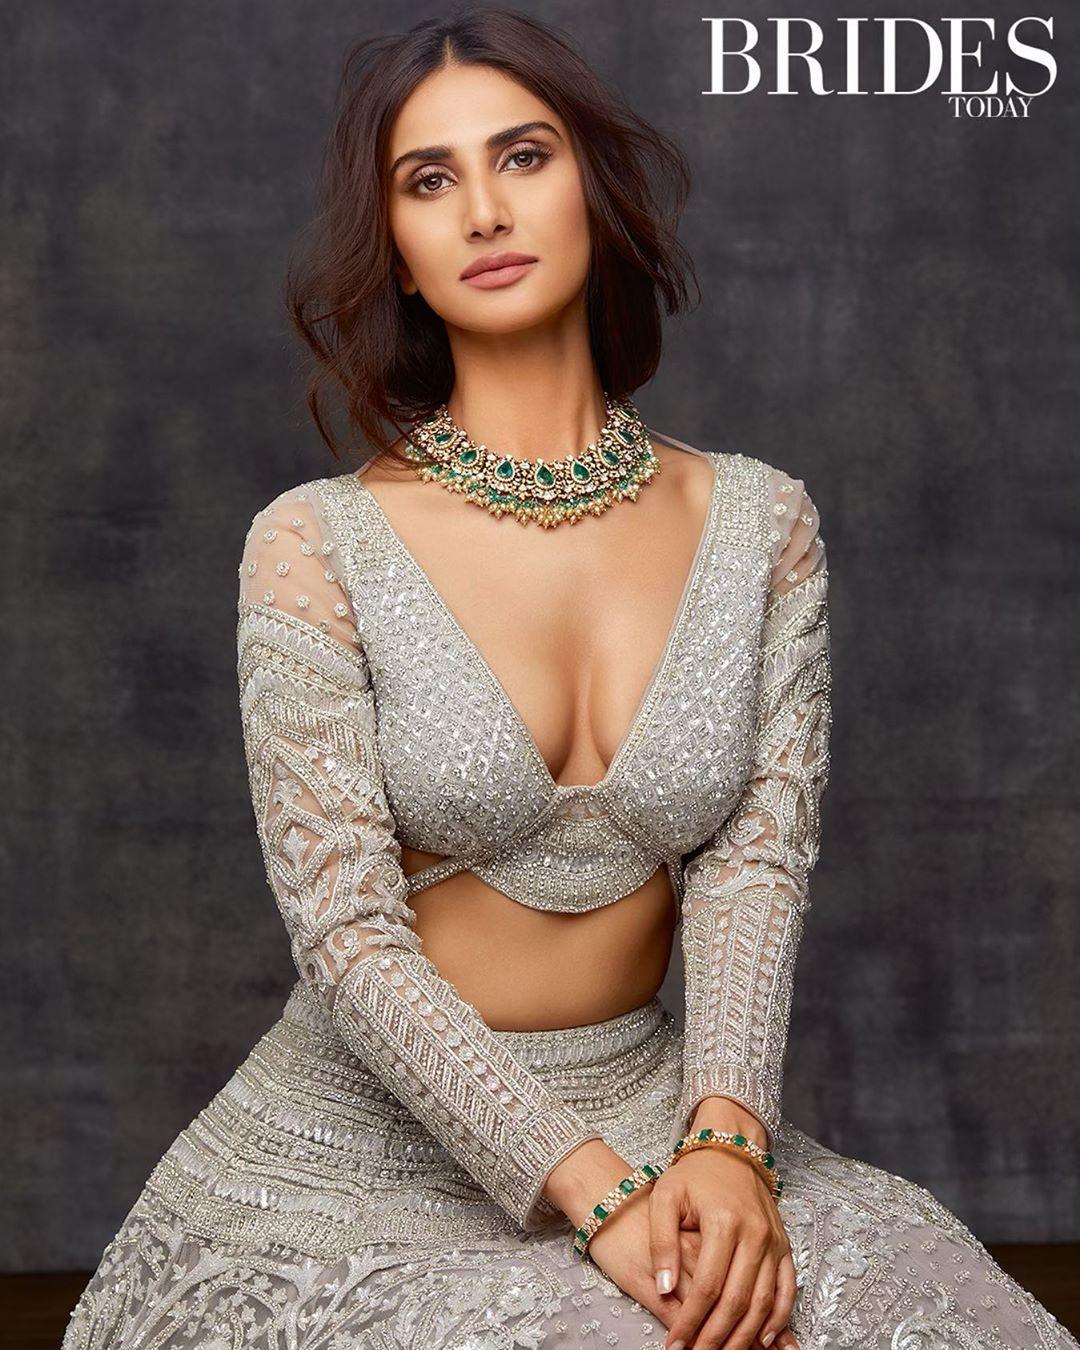 Vaani Kapoor Hot HD Navel Bikini Pictures New Pics